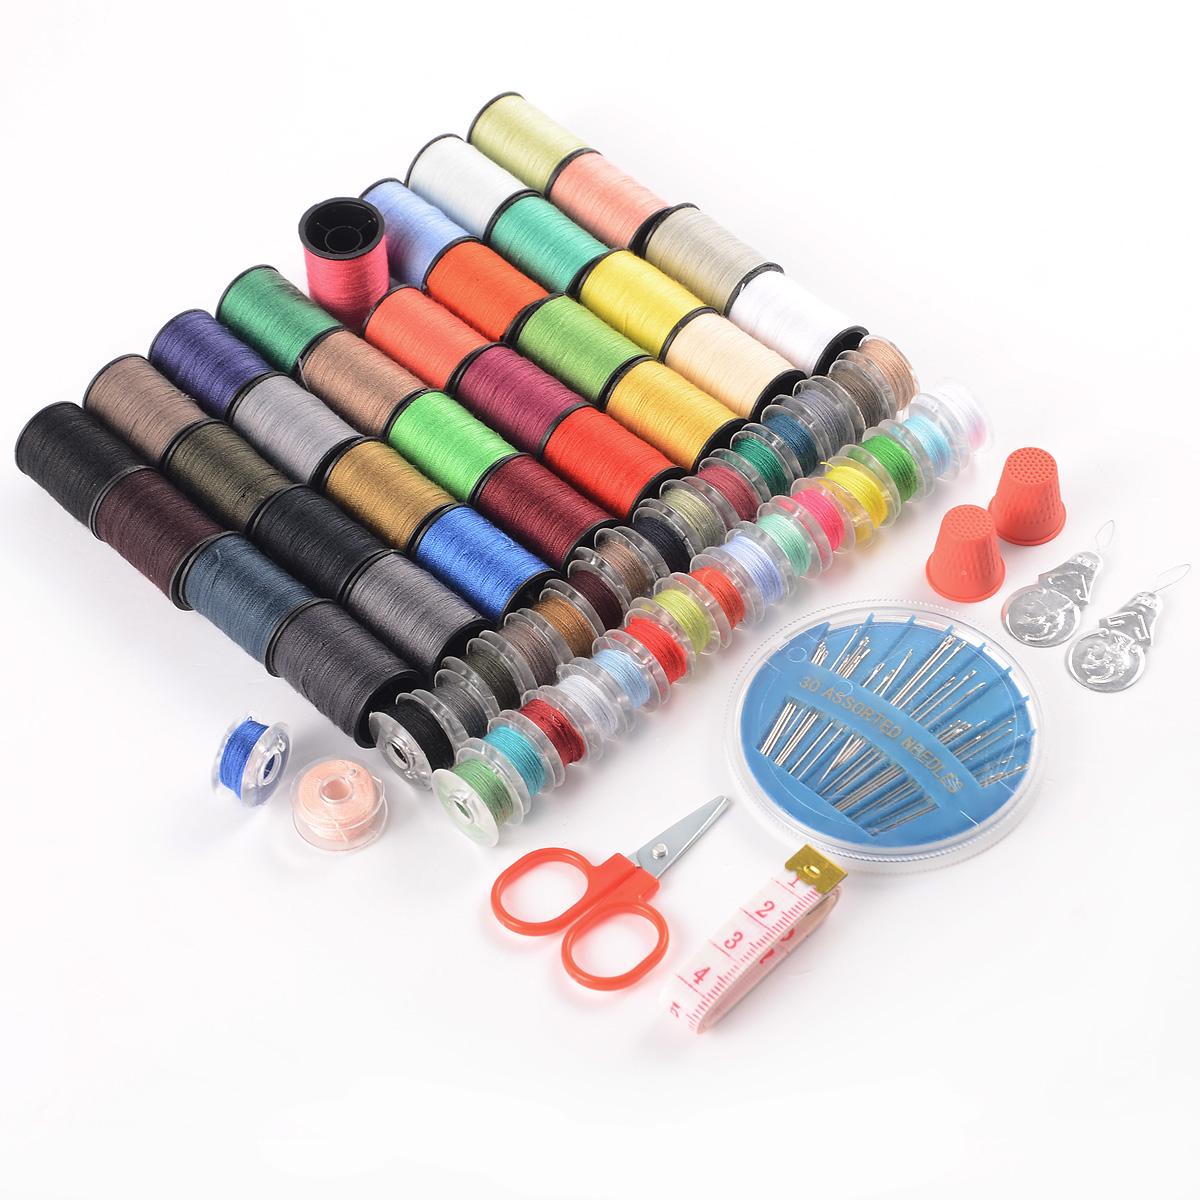 sewing machine 100 piece thread set spool bobbin set kit reel w scissors needles ebay. Black Bedroom Furniture Sets. Home Design Ideas